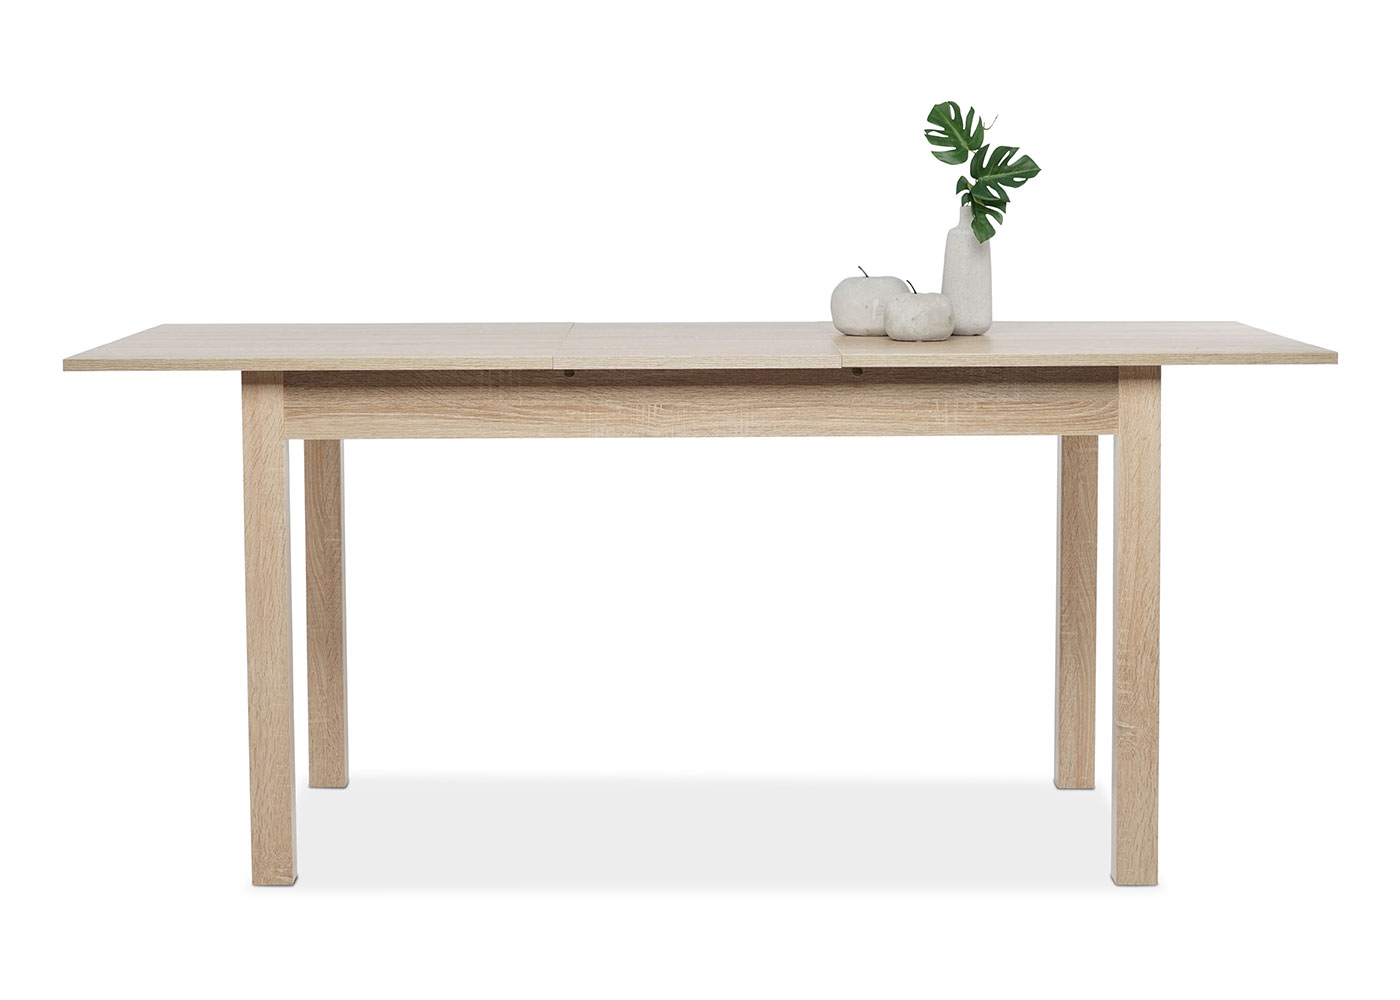 Jedálny stôl rozkladací Kronborg, 180 cm, dub, dub